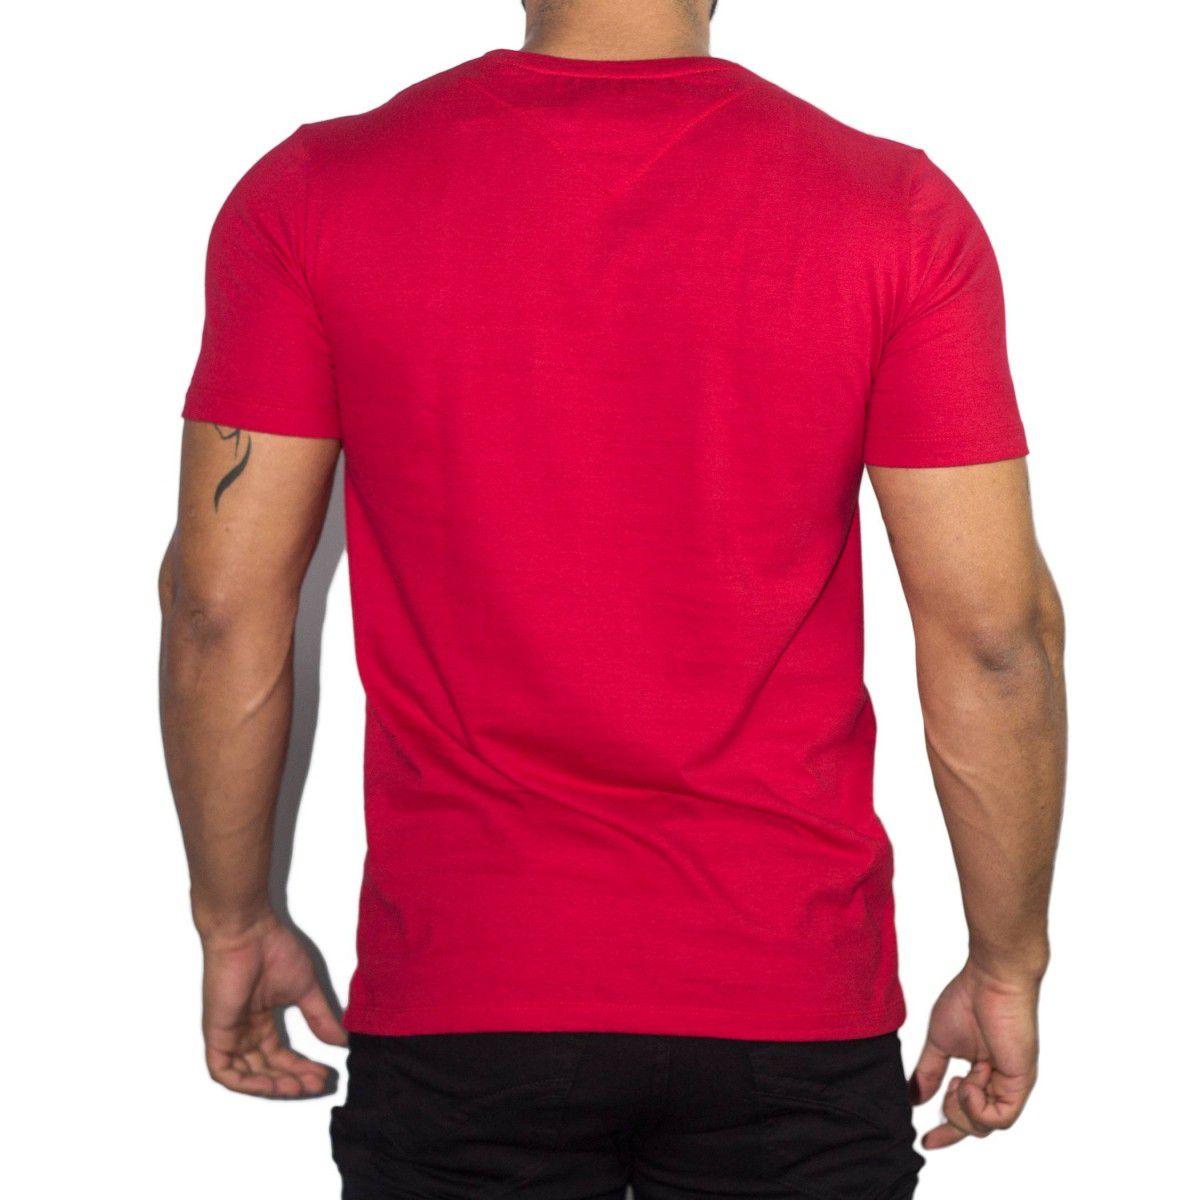 Camiseta Etnica Zíper